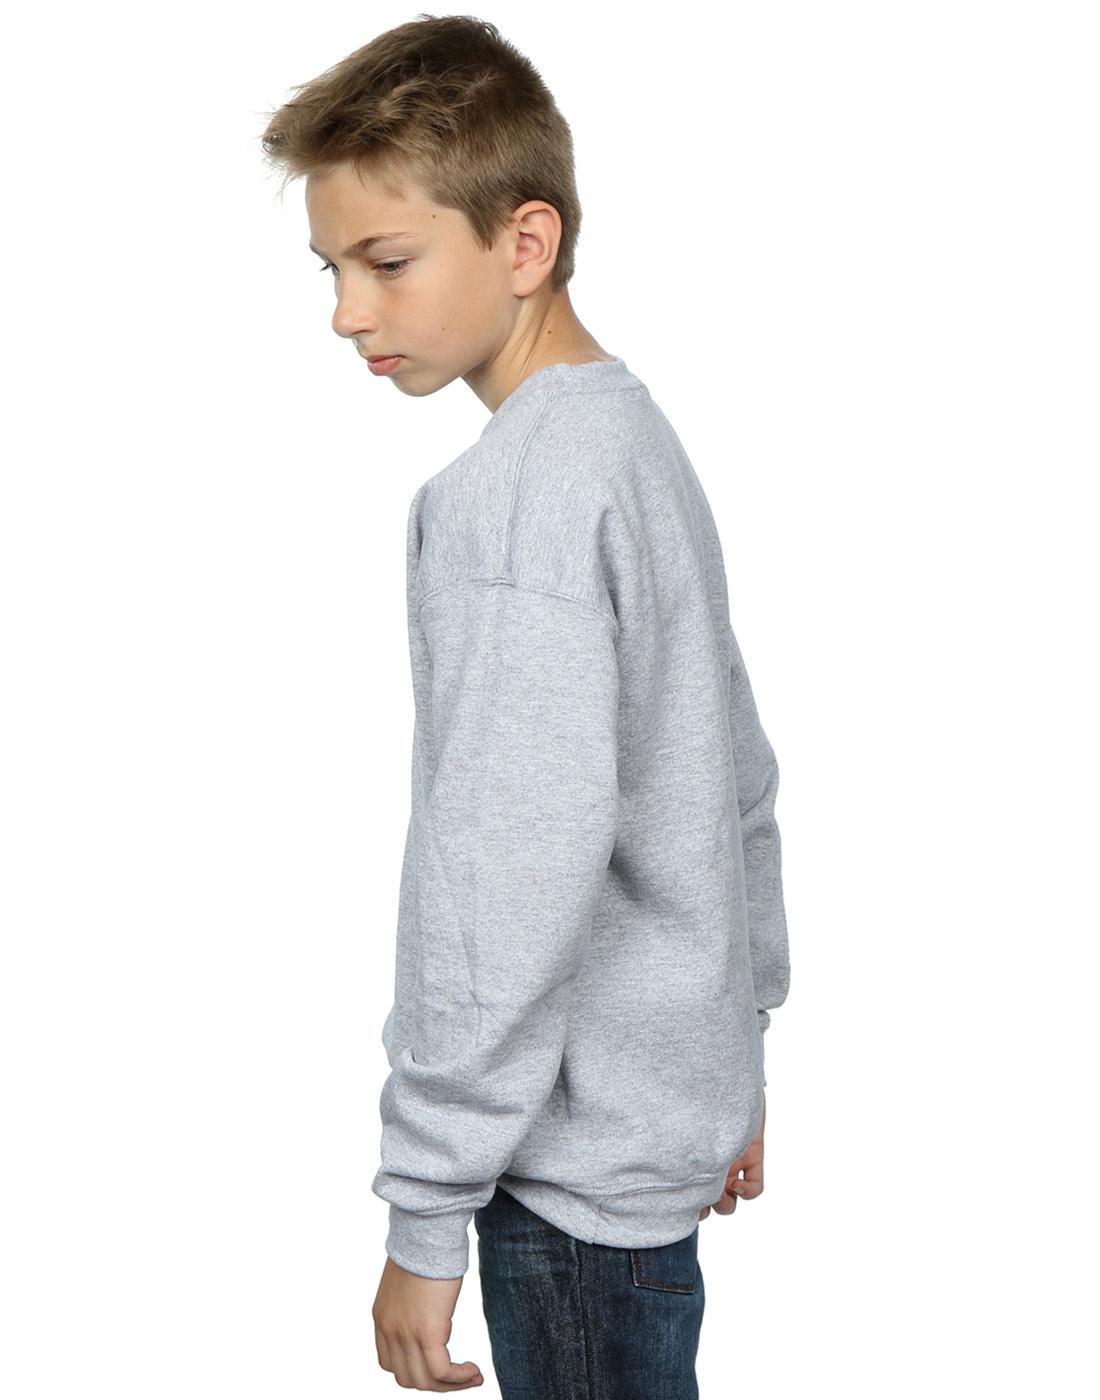 Elf-Garcon-Hug-Buddy-Sweat-Shirt